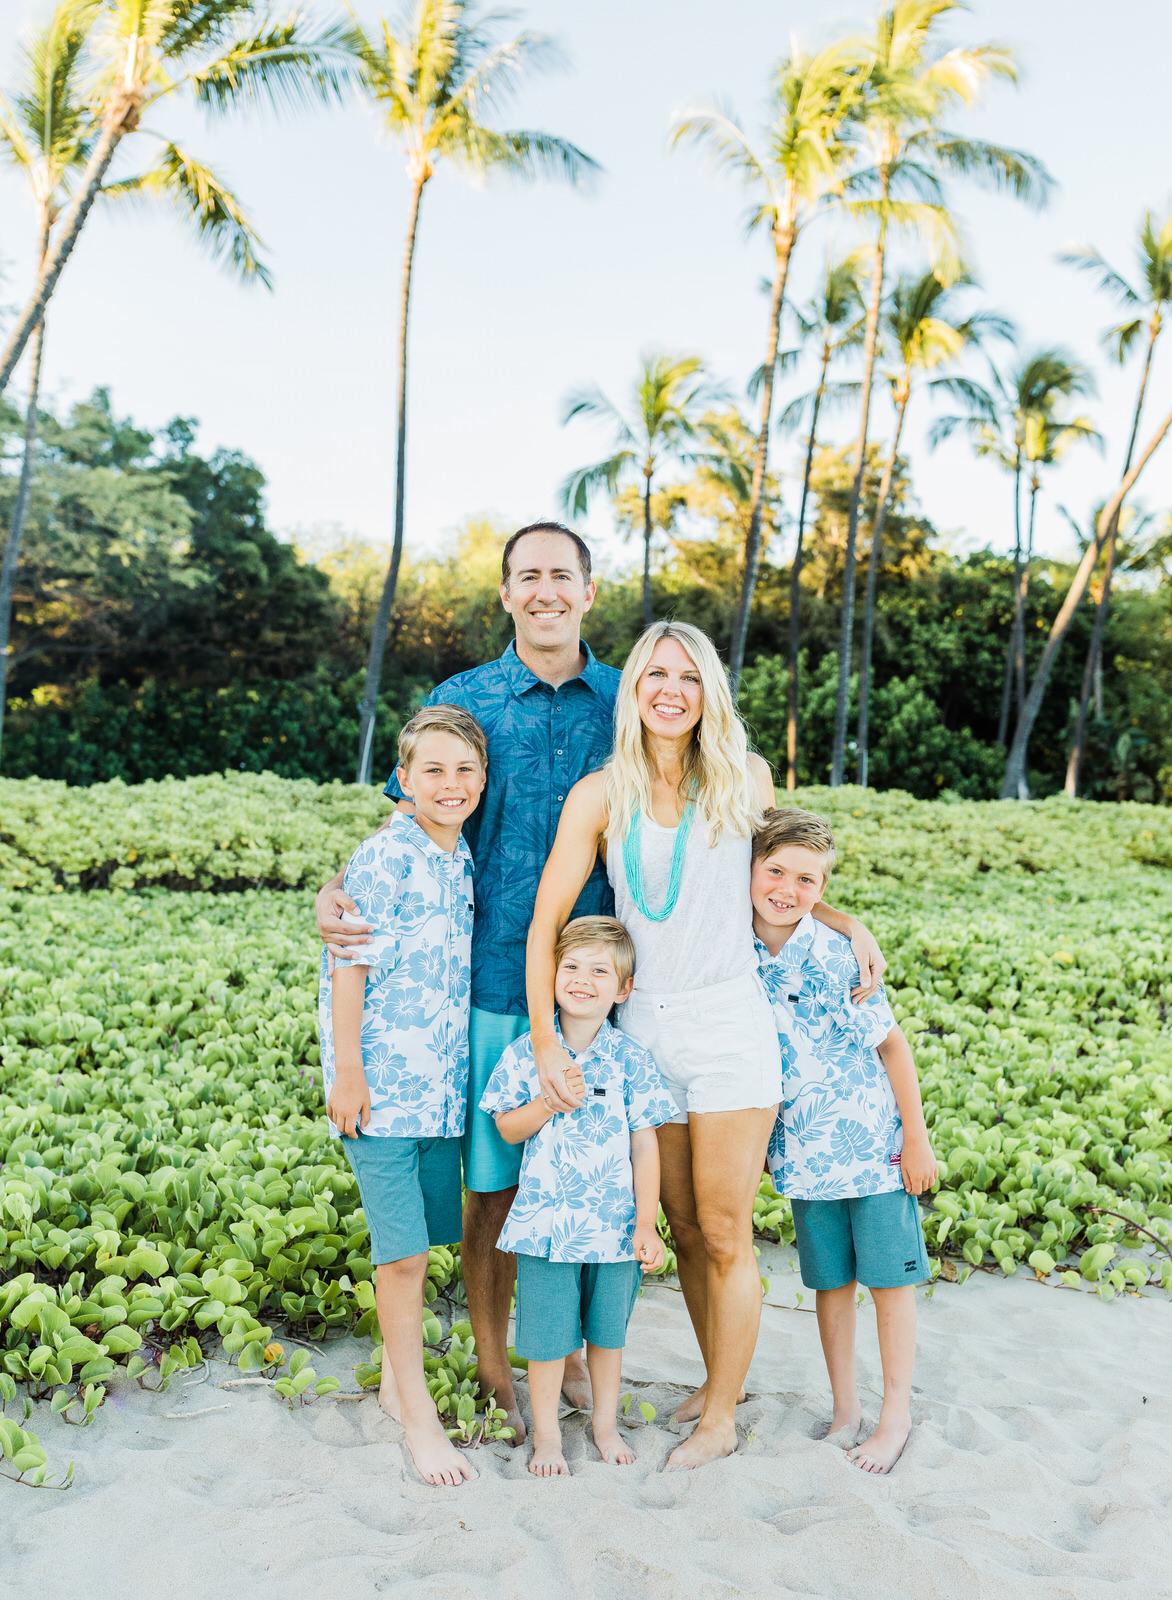 big-island-photographer-family-session-mauna-kea-resort-summer-waikoloa-sunrise-3543.jpg